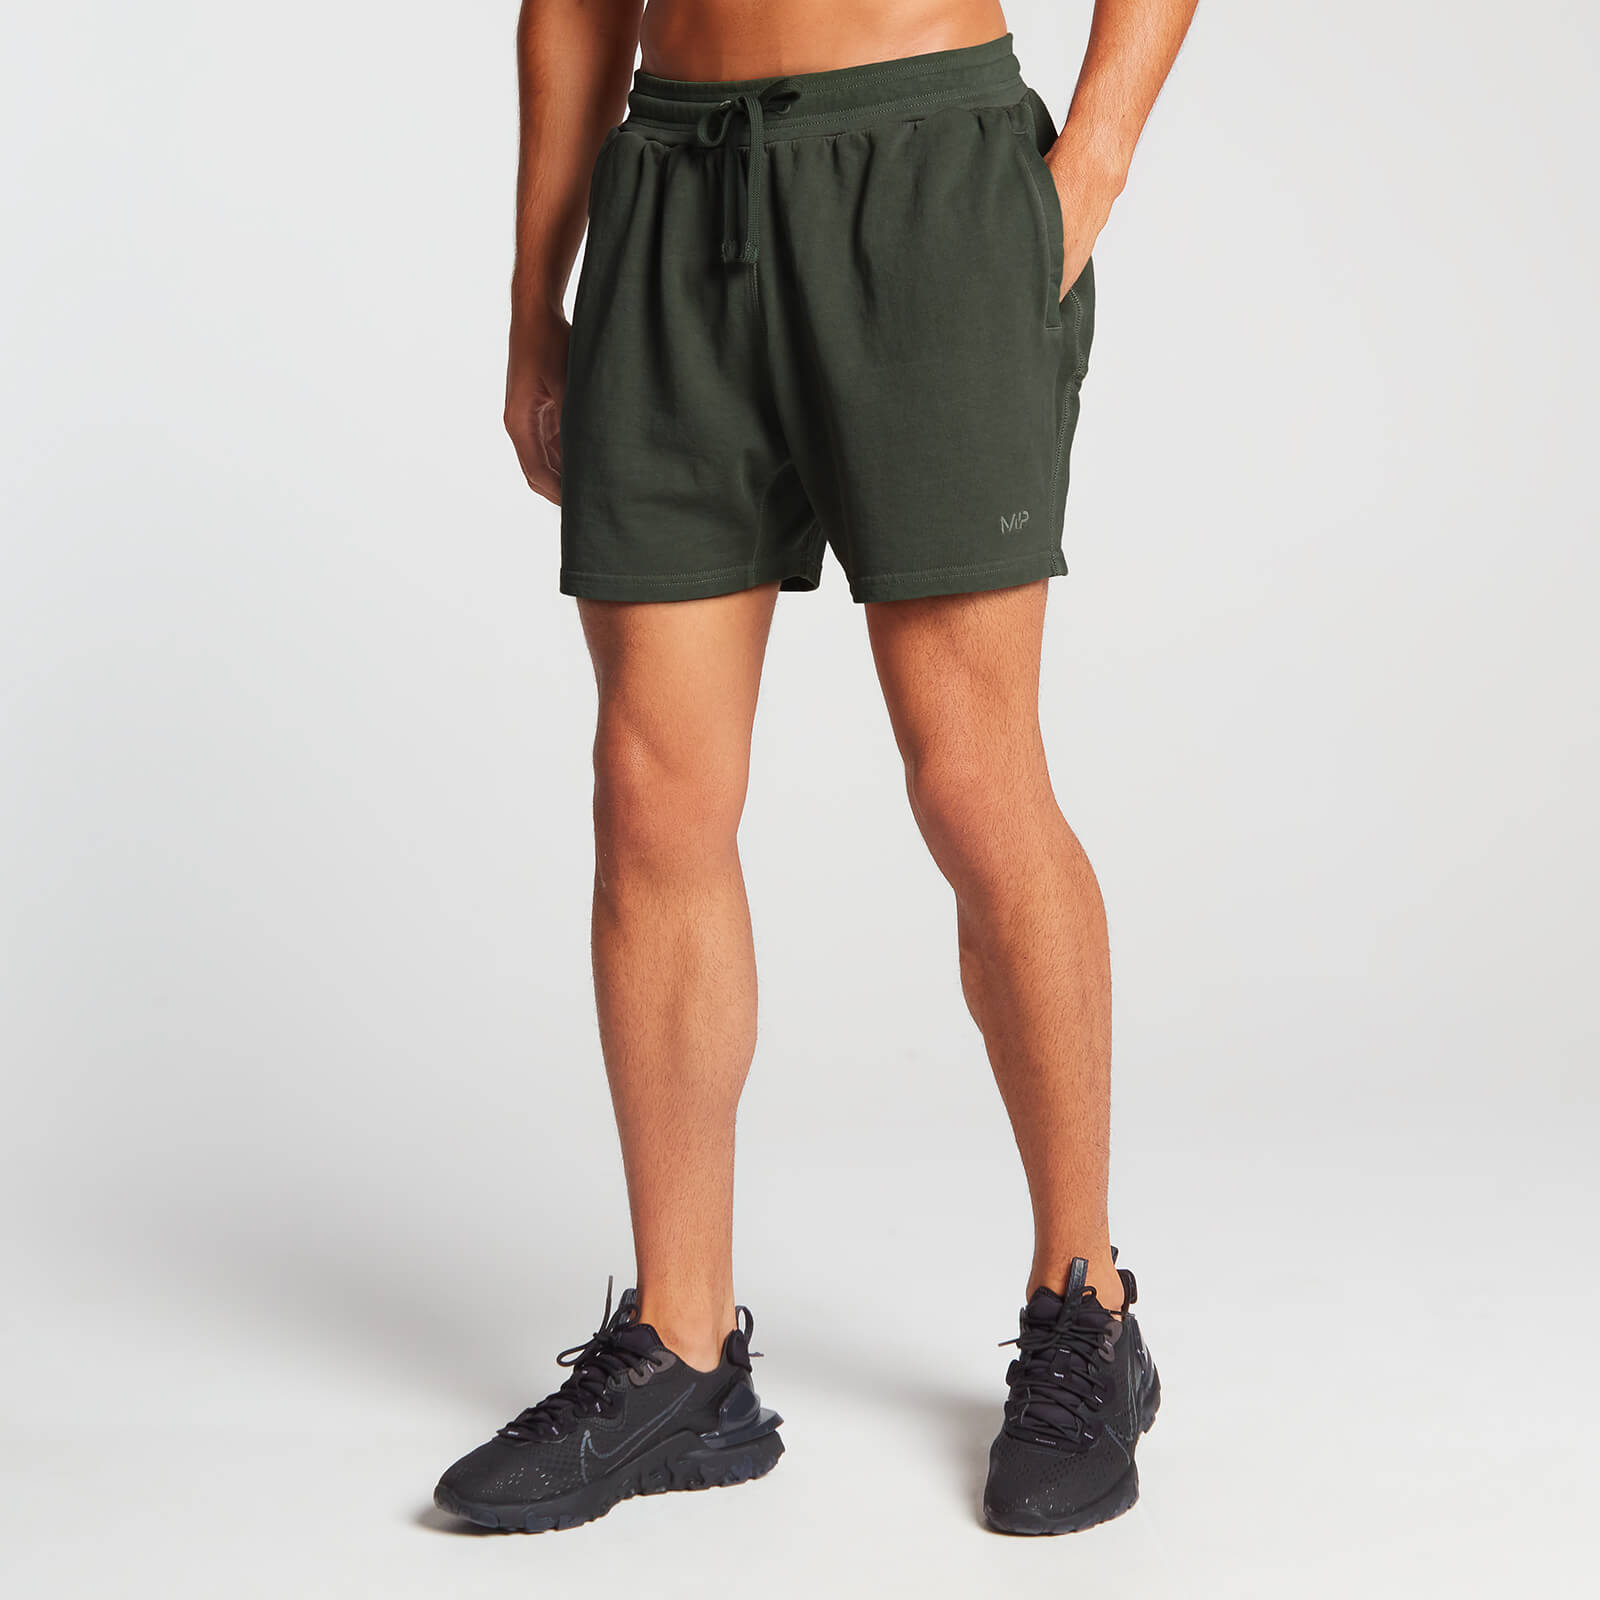 MP Men's Raw Training Shorts - Vine Leaf   - XXS